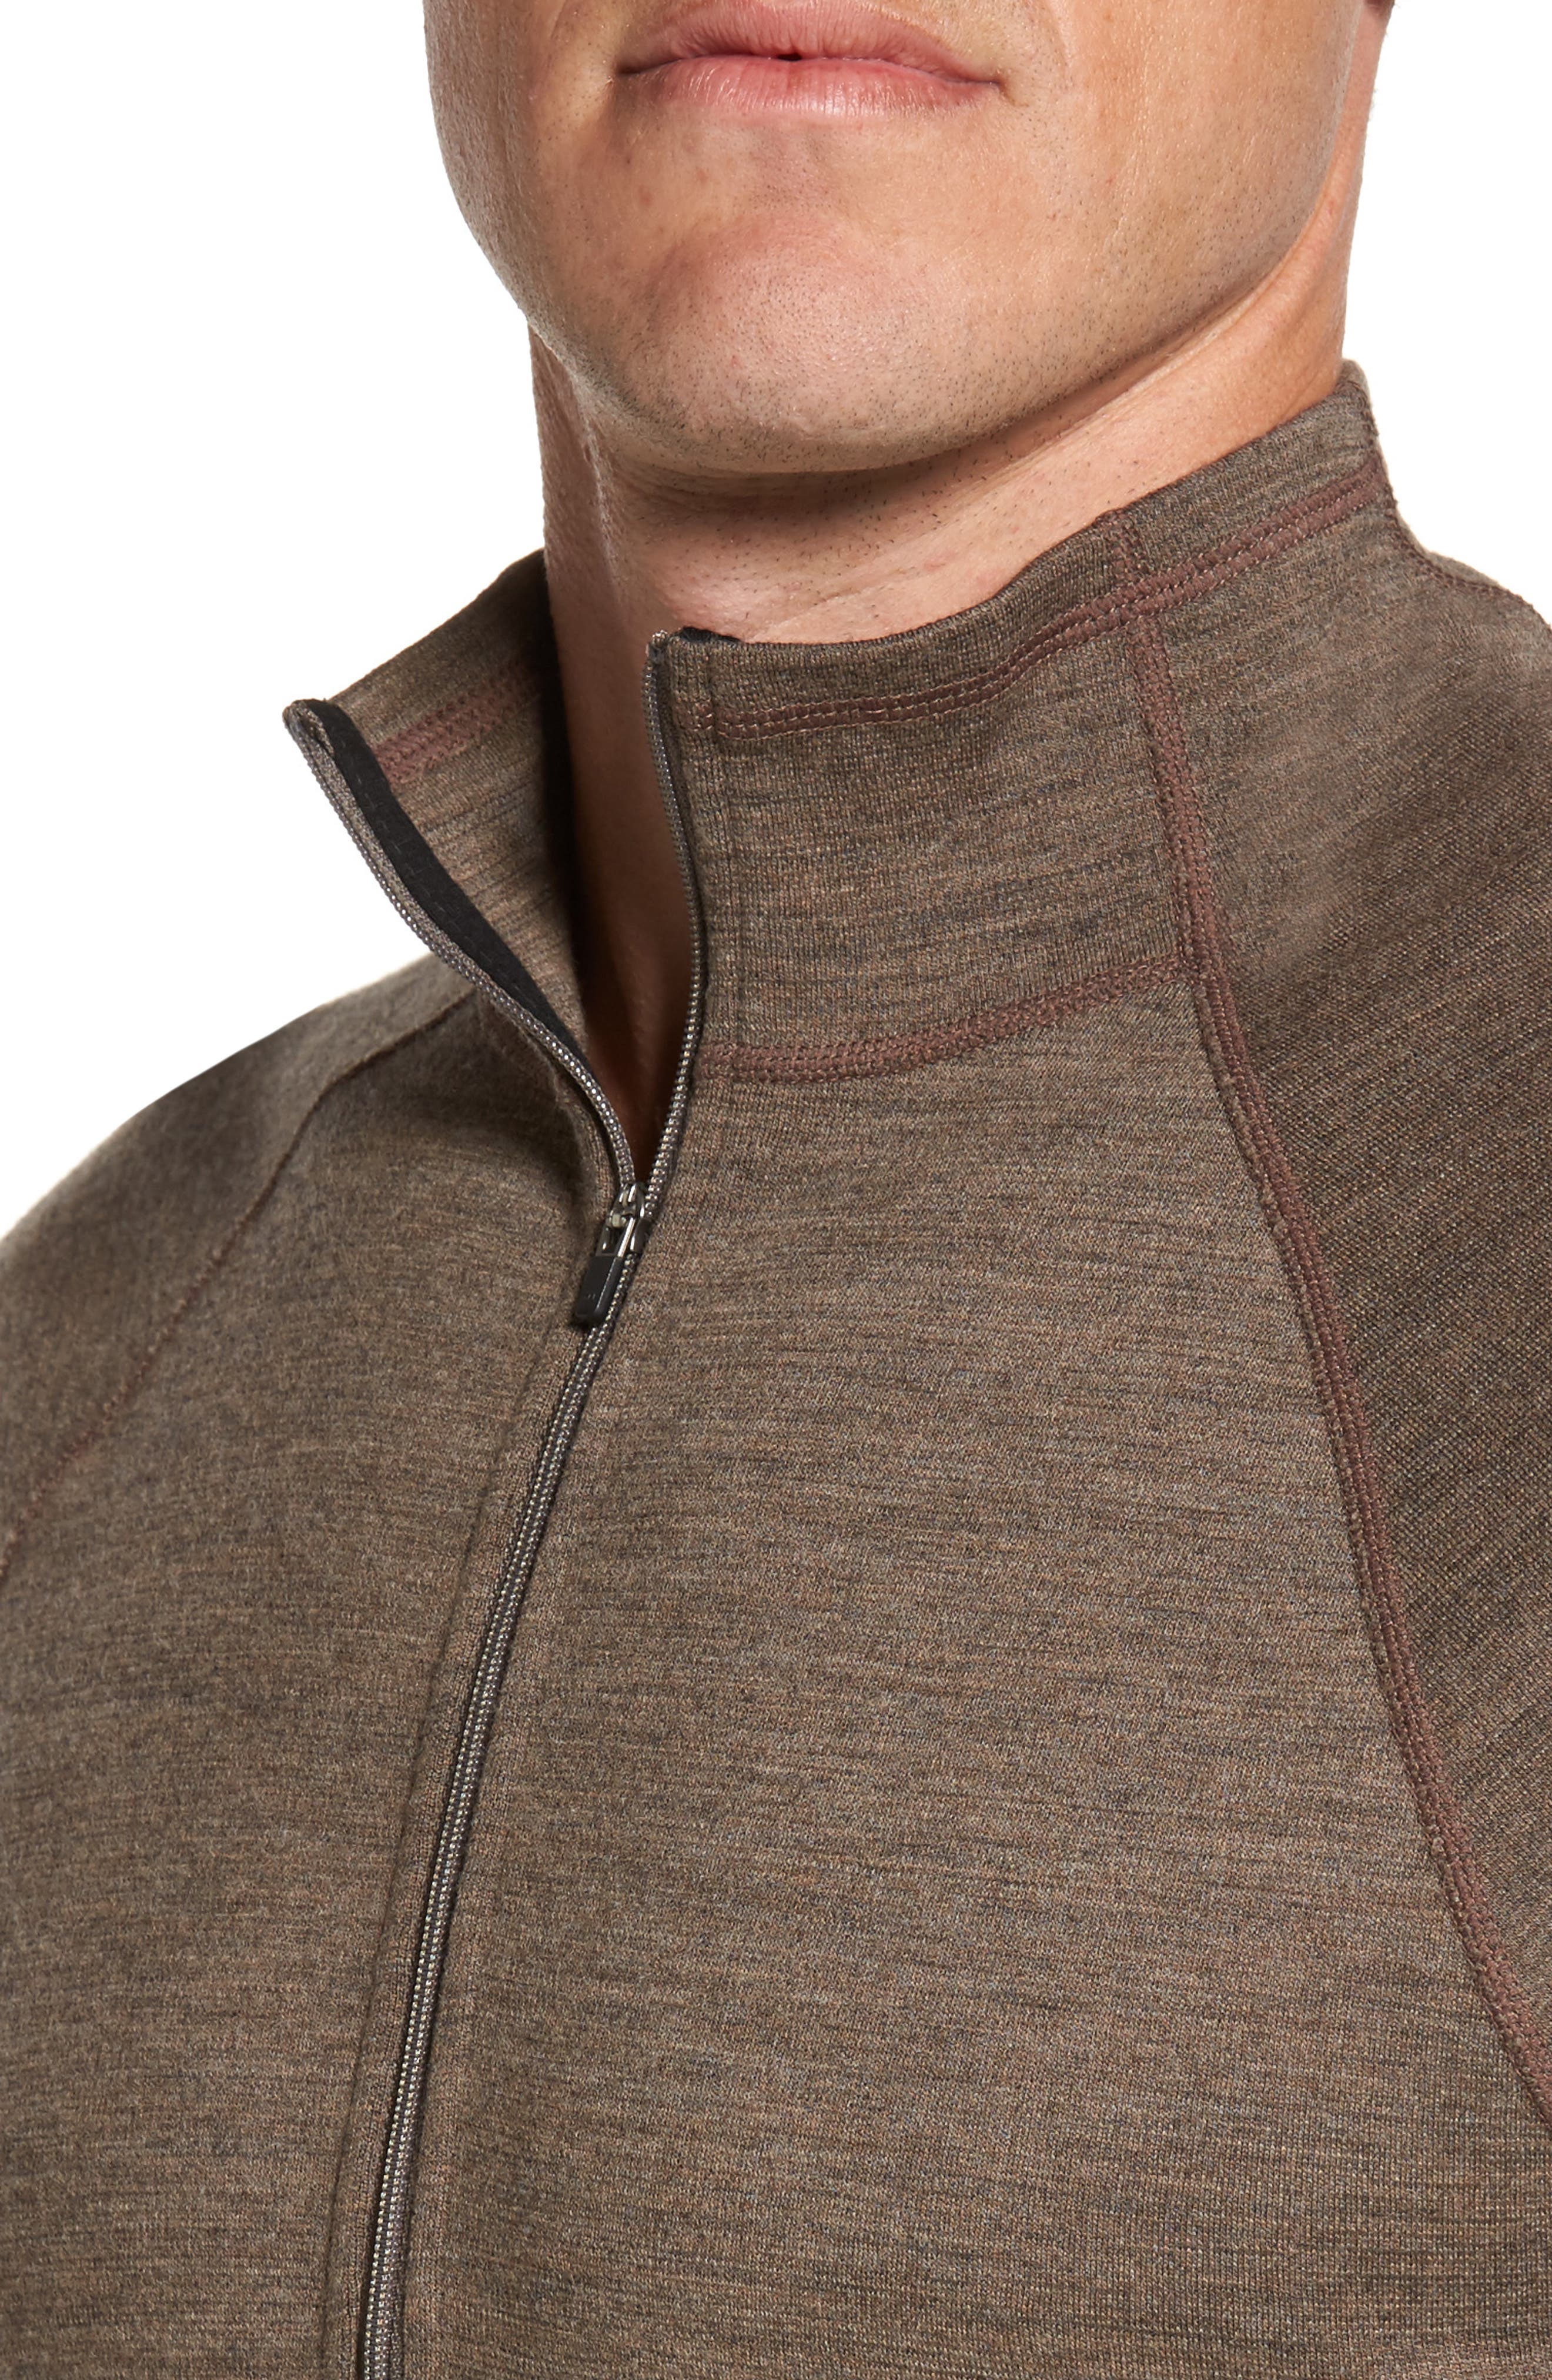 'Shak' Merino Wool Quarter Zip Top,                             Alternate thumbnail 3, color,                             Dark Rye Heather